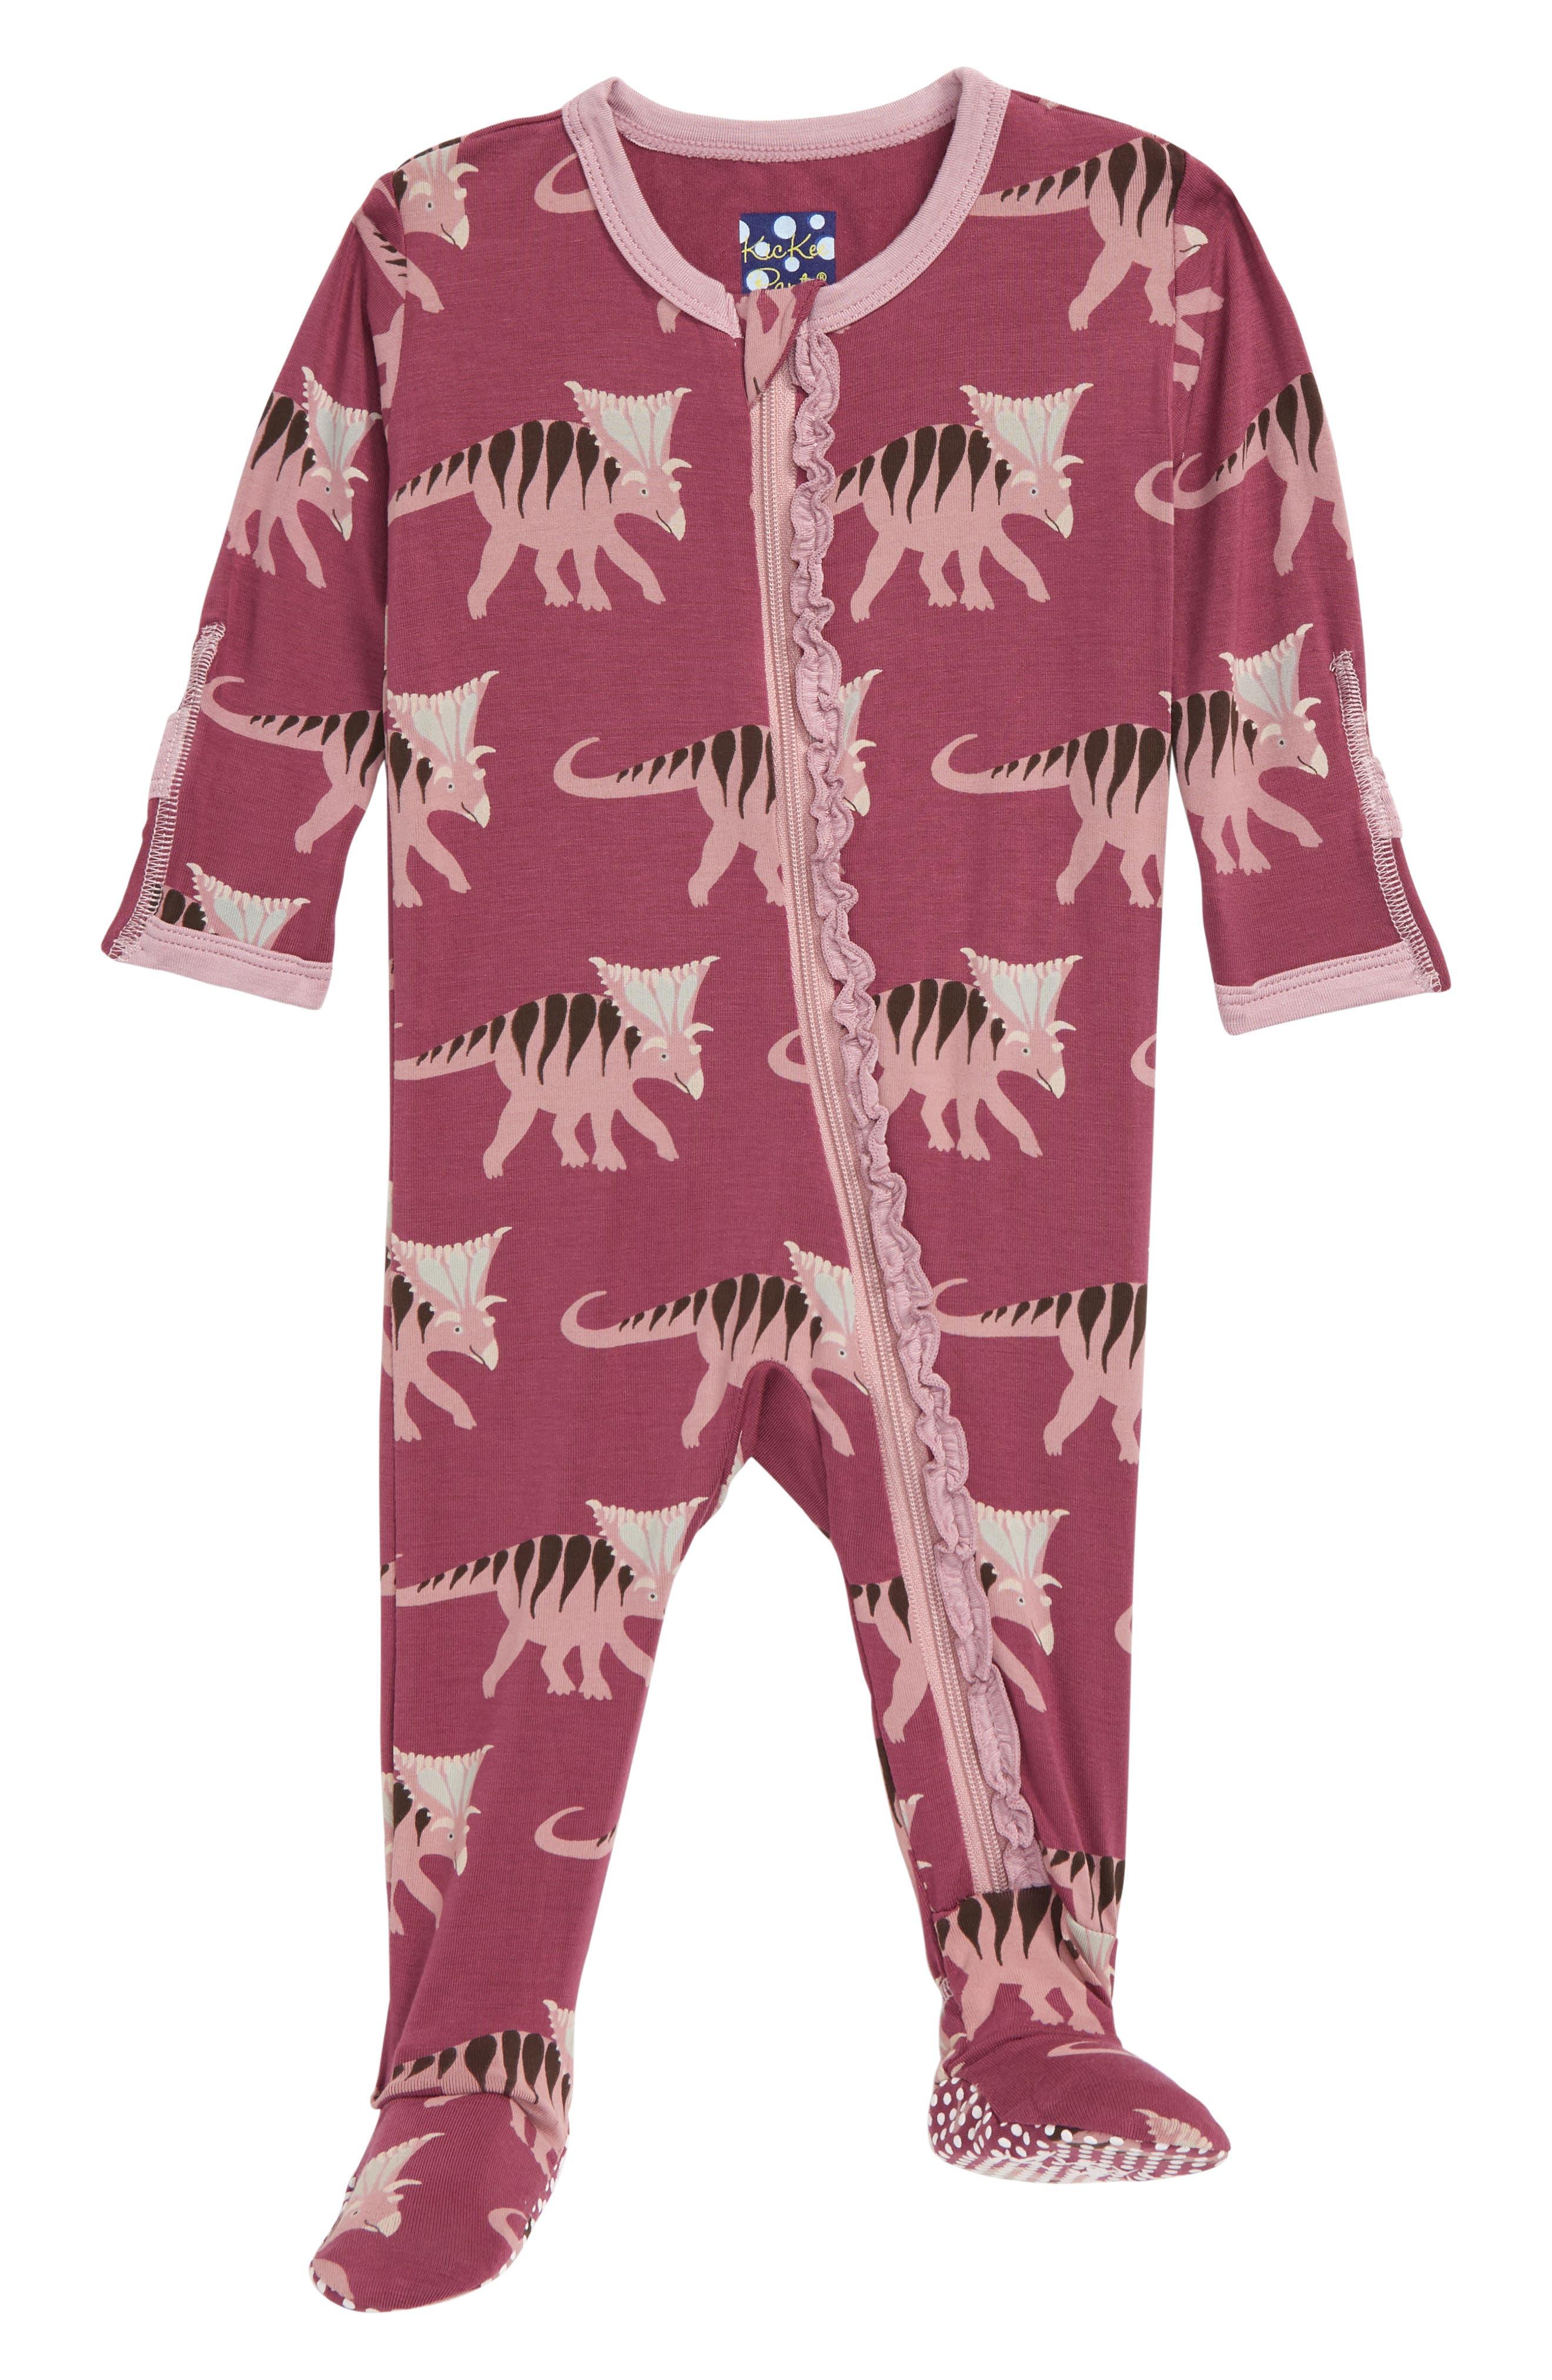 Infant Girls Kickee Pants Muffin Ruffle Footie Size 1824M  Purple